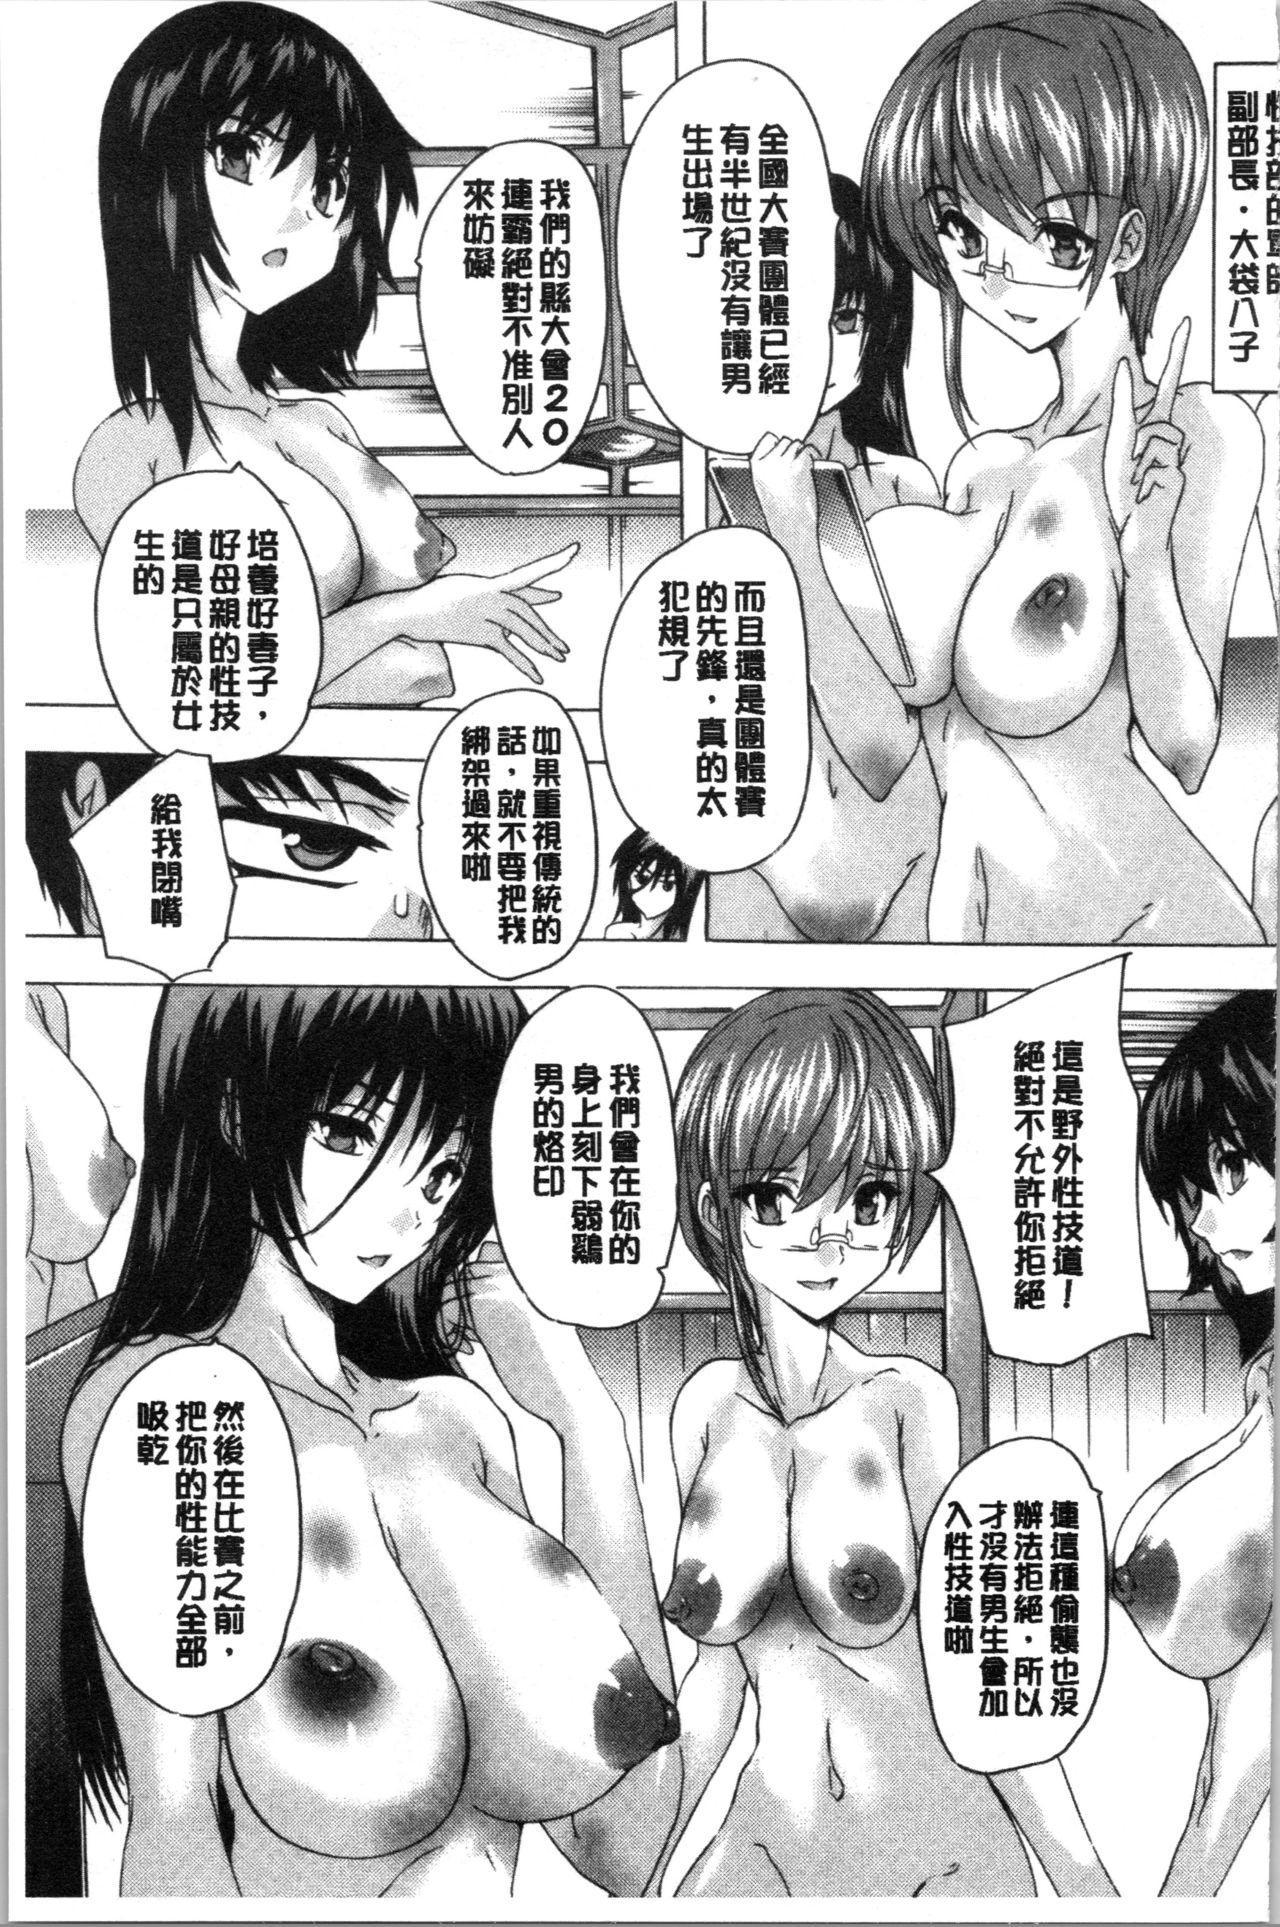 [Natsuka Q-Ya] Hisshuu!! Sex-bu - SEIGI-DO The Ultimate Martial Arts   必修!!性愛淫交部 [Chinese] 143